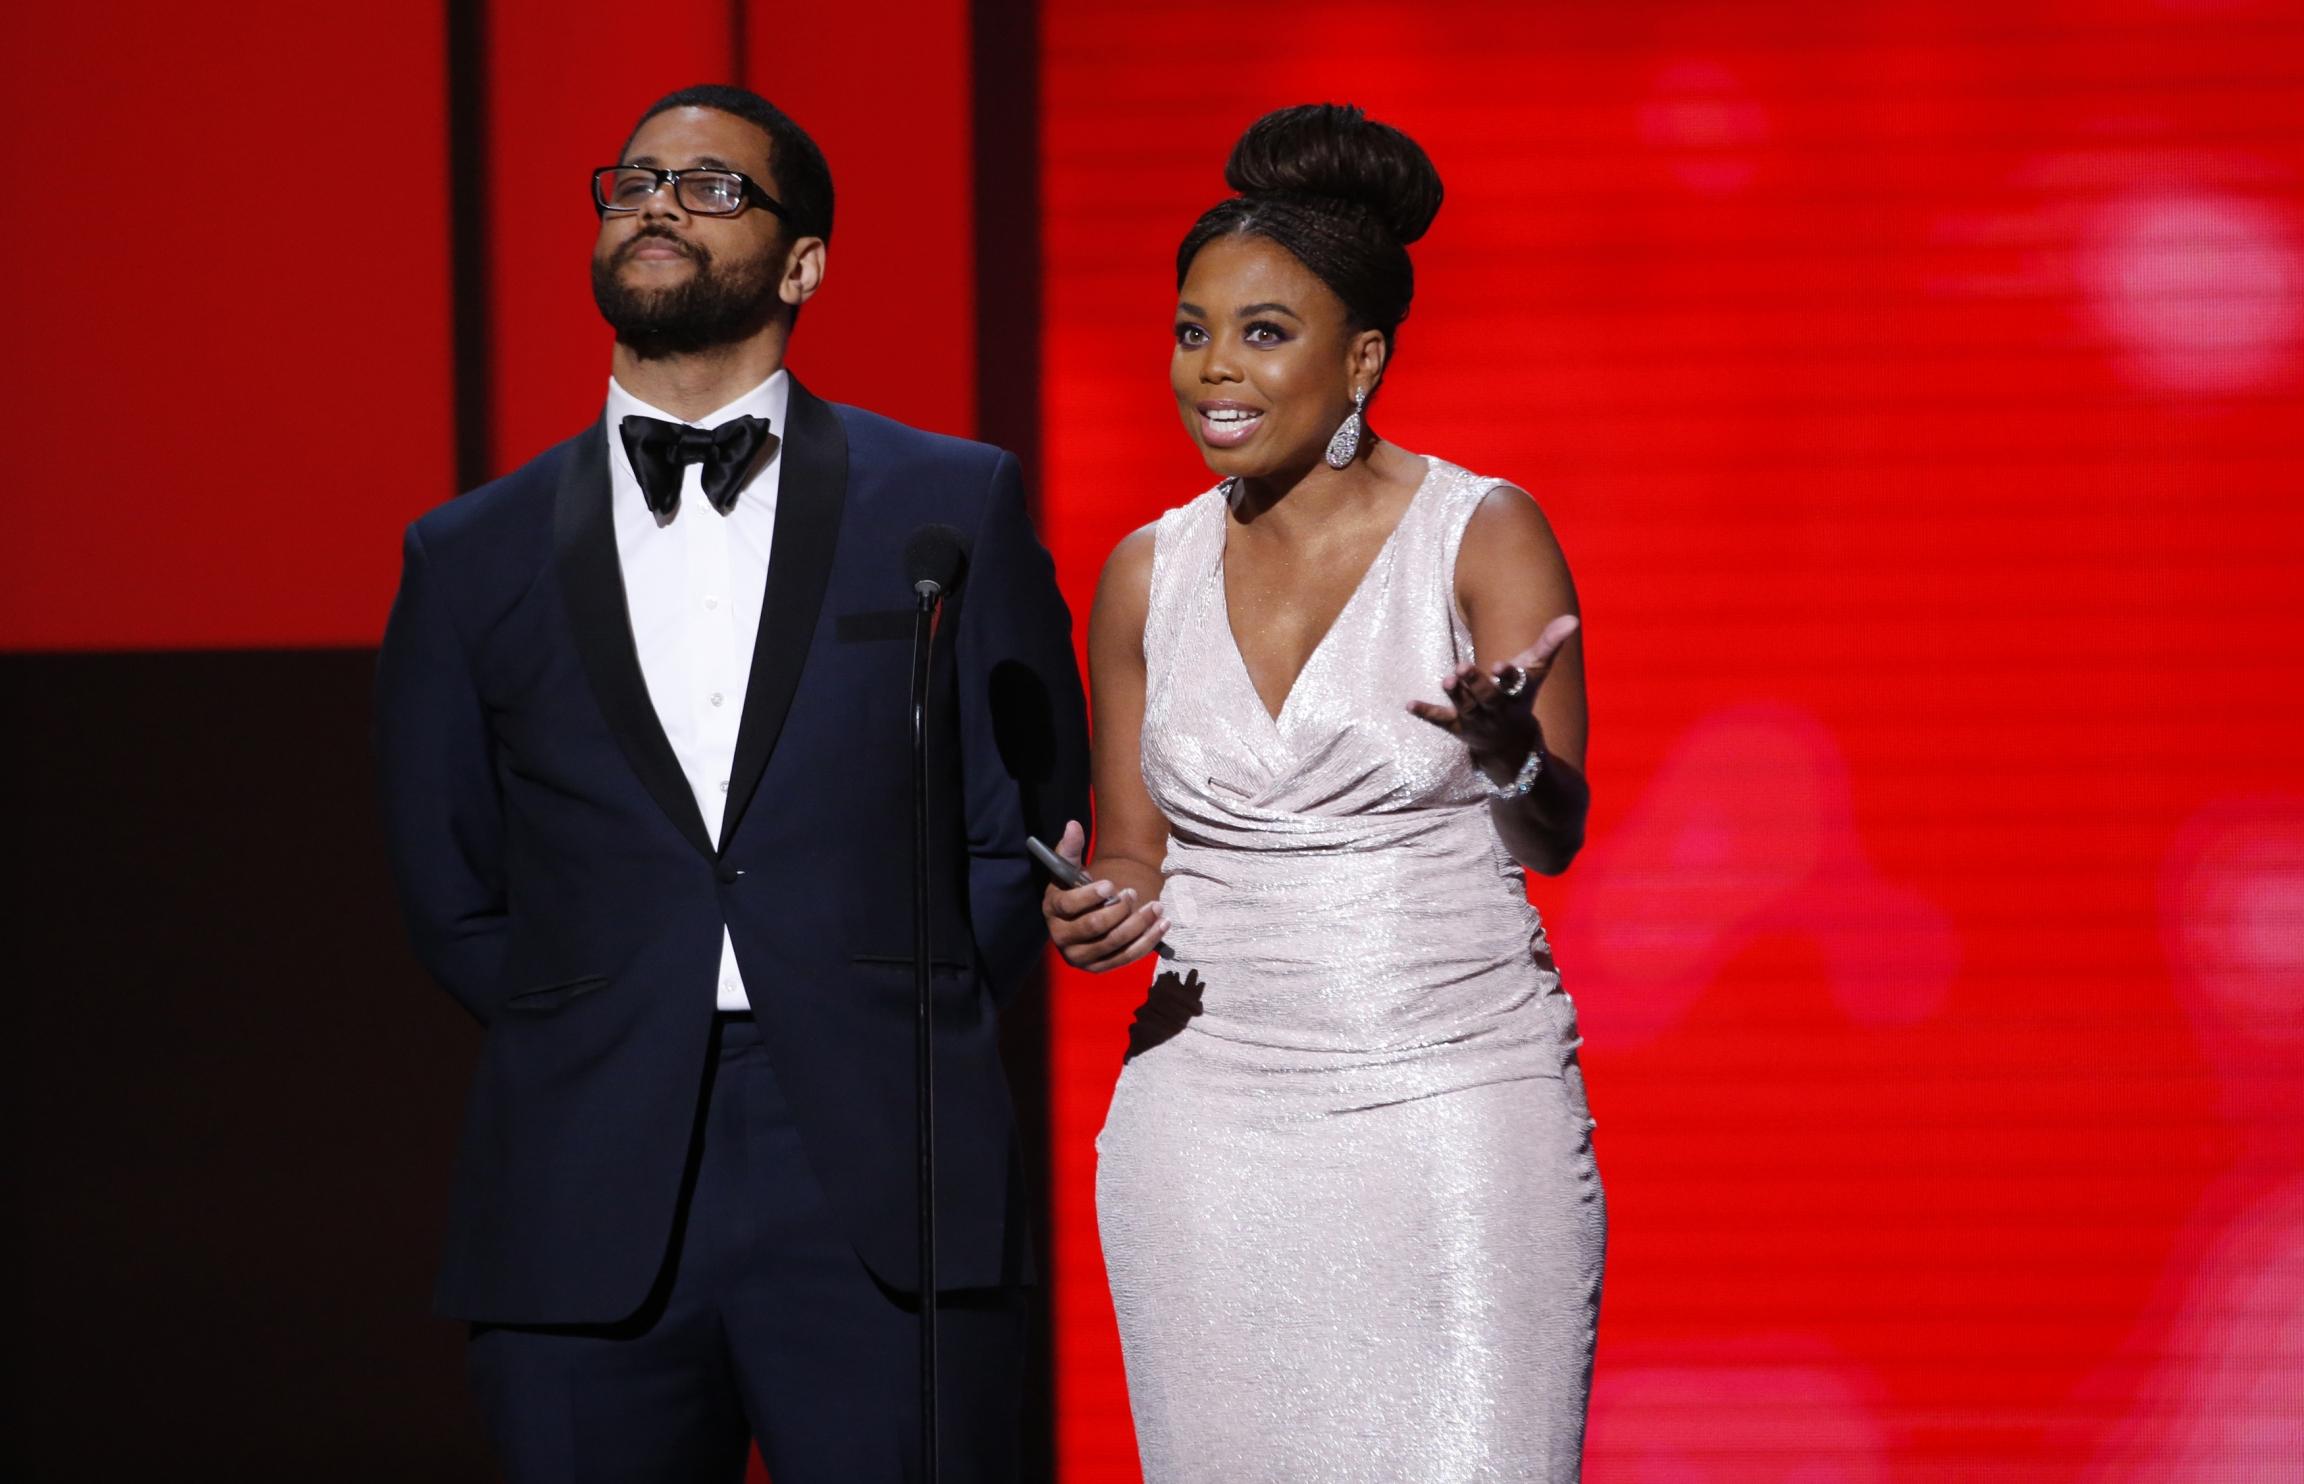 PresentersJemeleHilland Michael Smith speak on stage at 49th NAACP Image Awards.